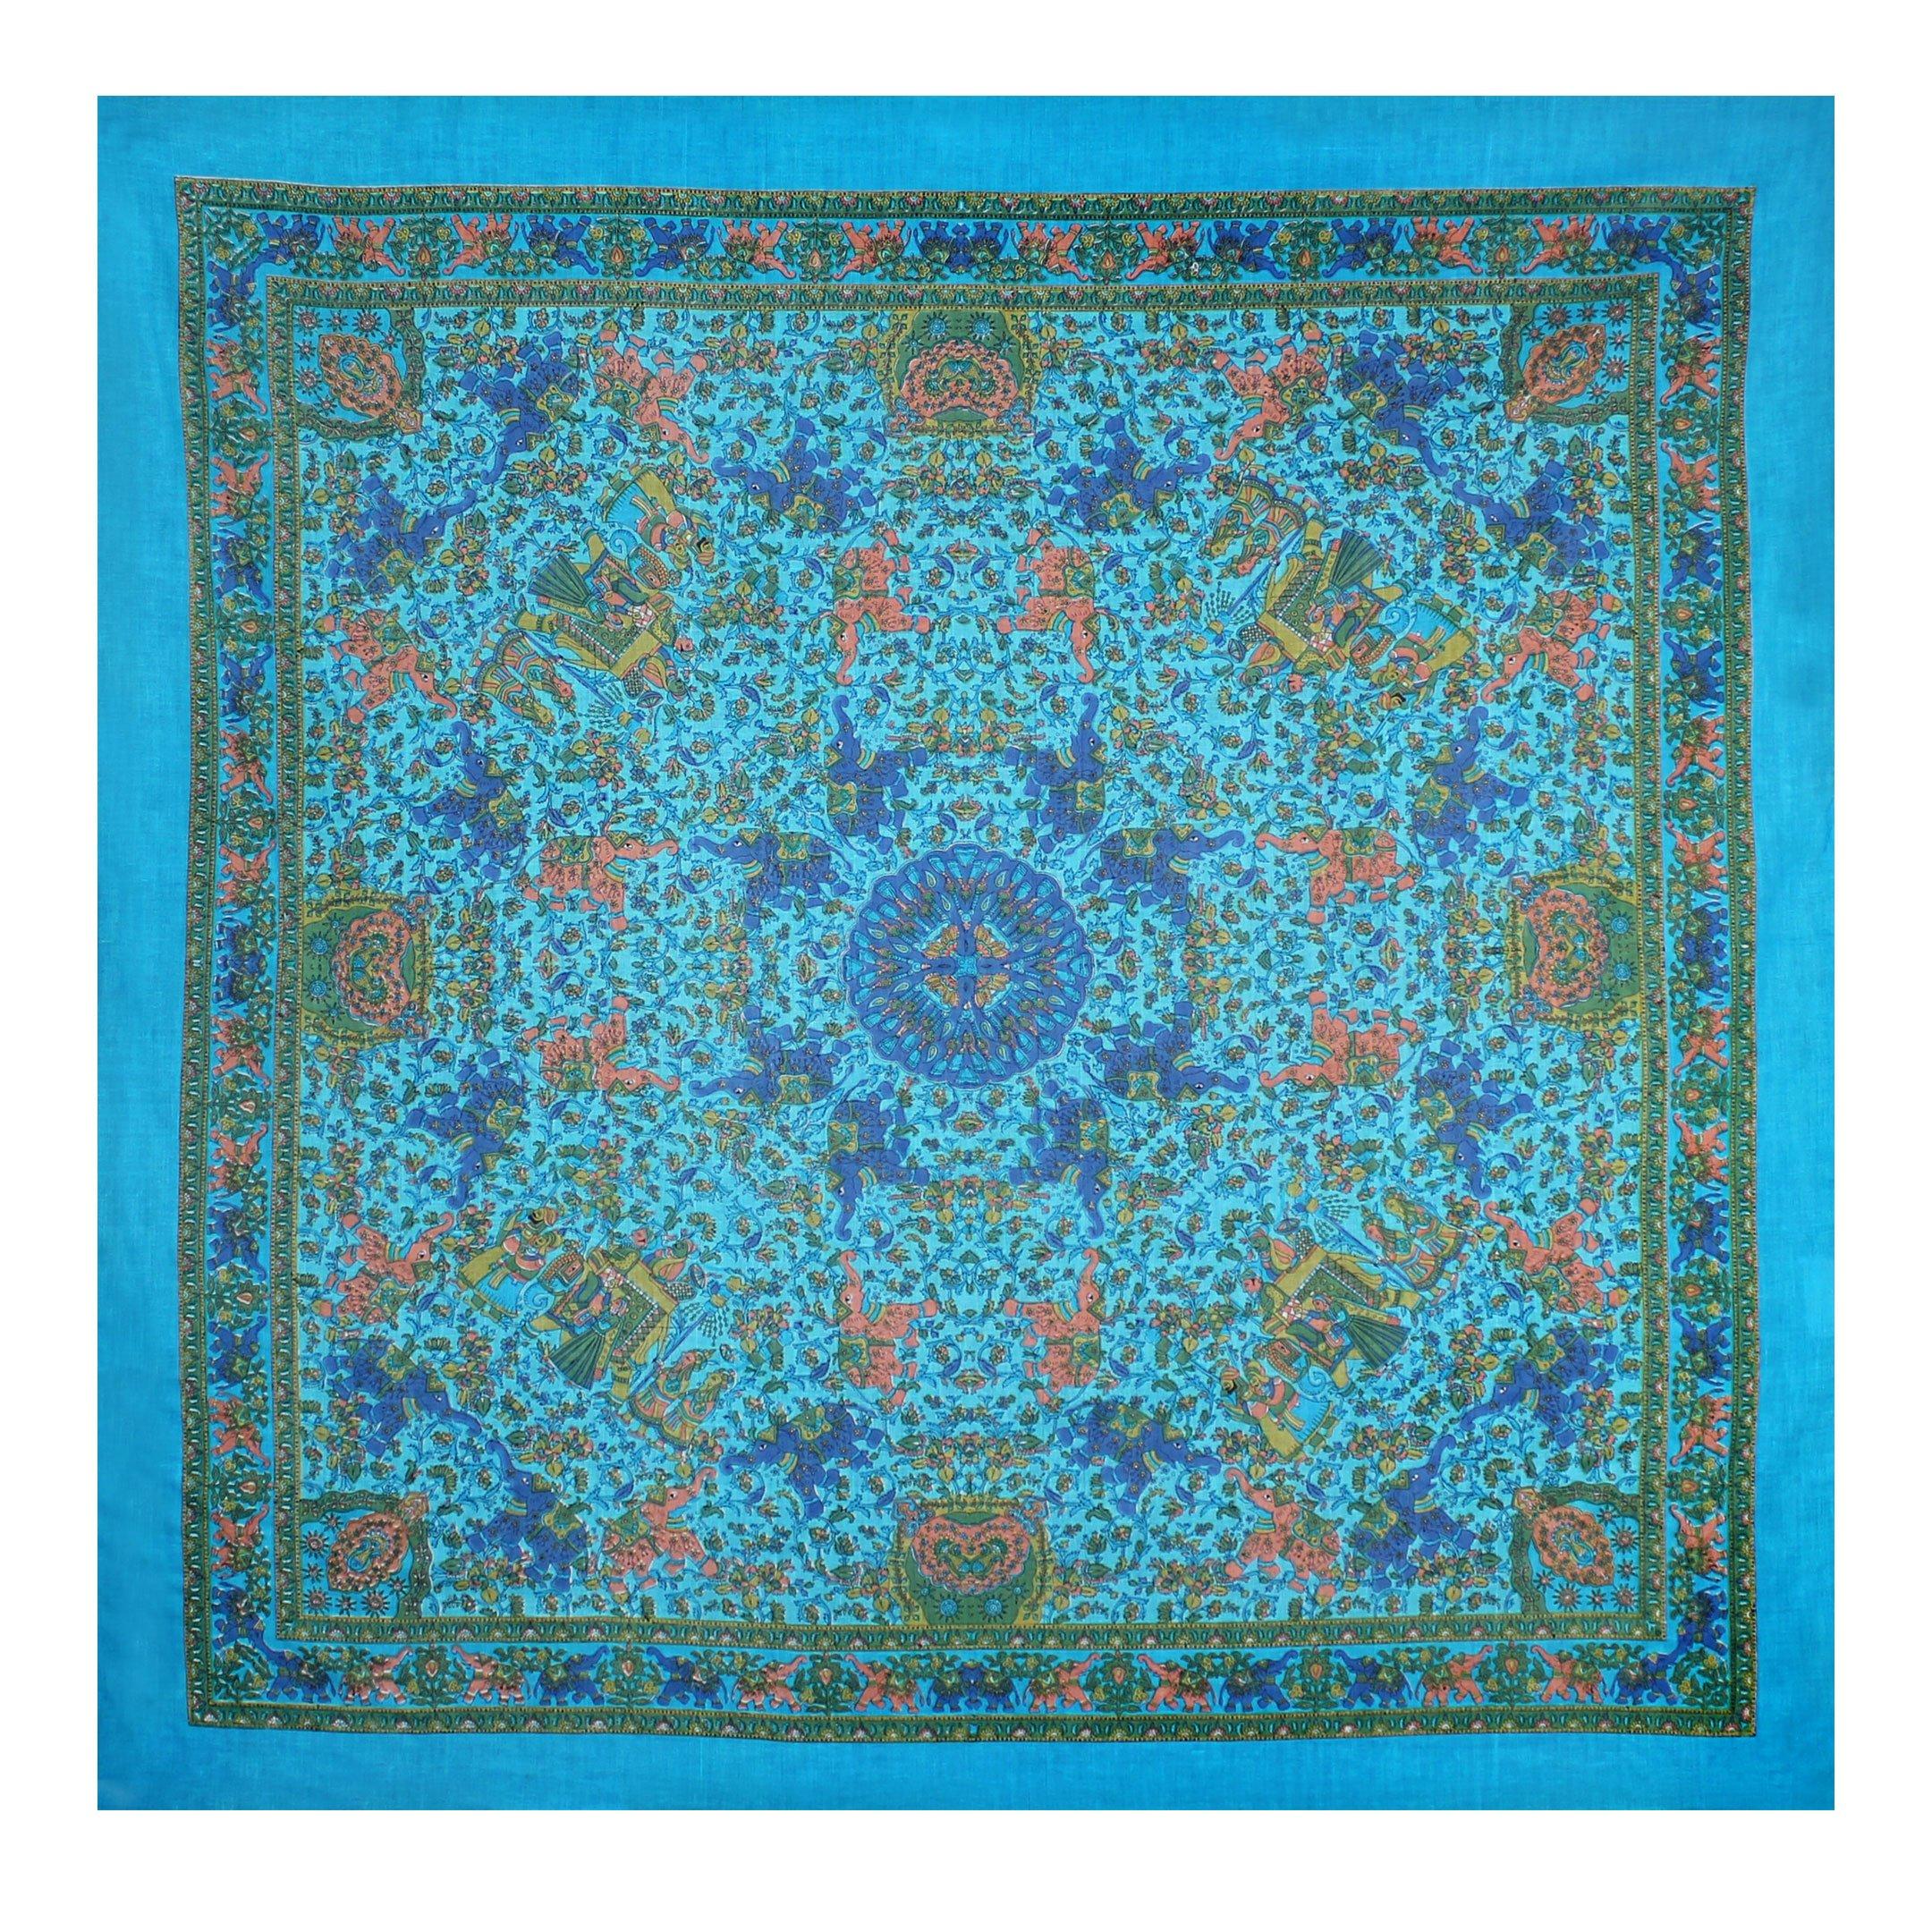 Fashionable Cotton Scarf - Indian Elephant Print - Hippie Style